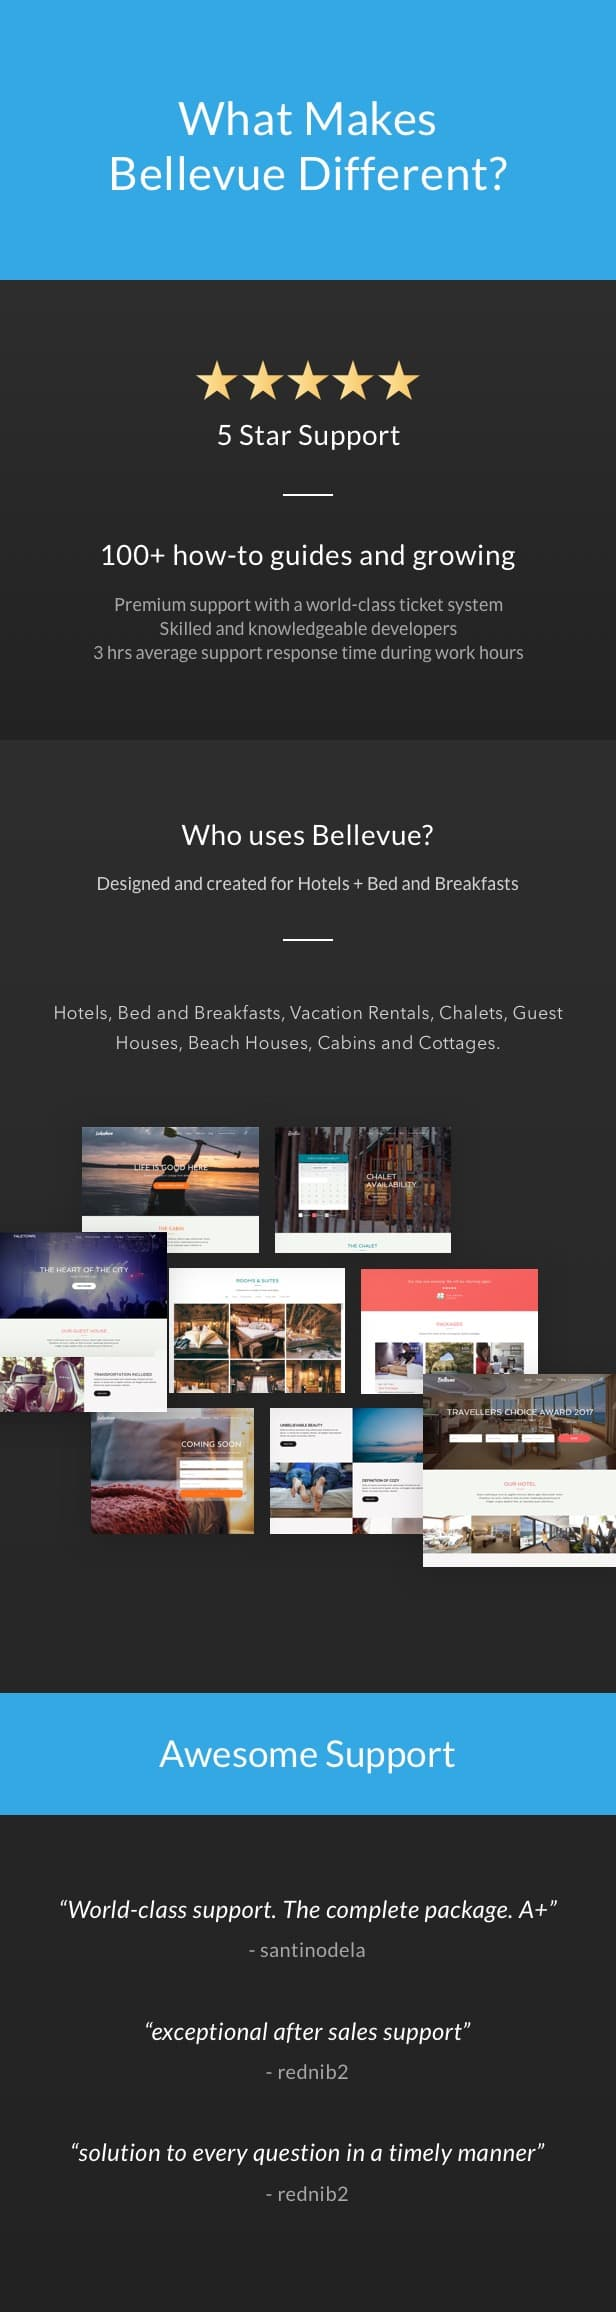 06 bellevue hotel bnb wordpress theme - Hotel + Bed and Breakfast Booking Calendar Theme | Bellevue